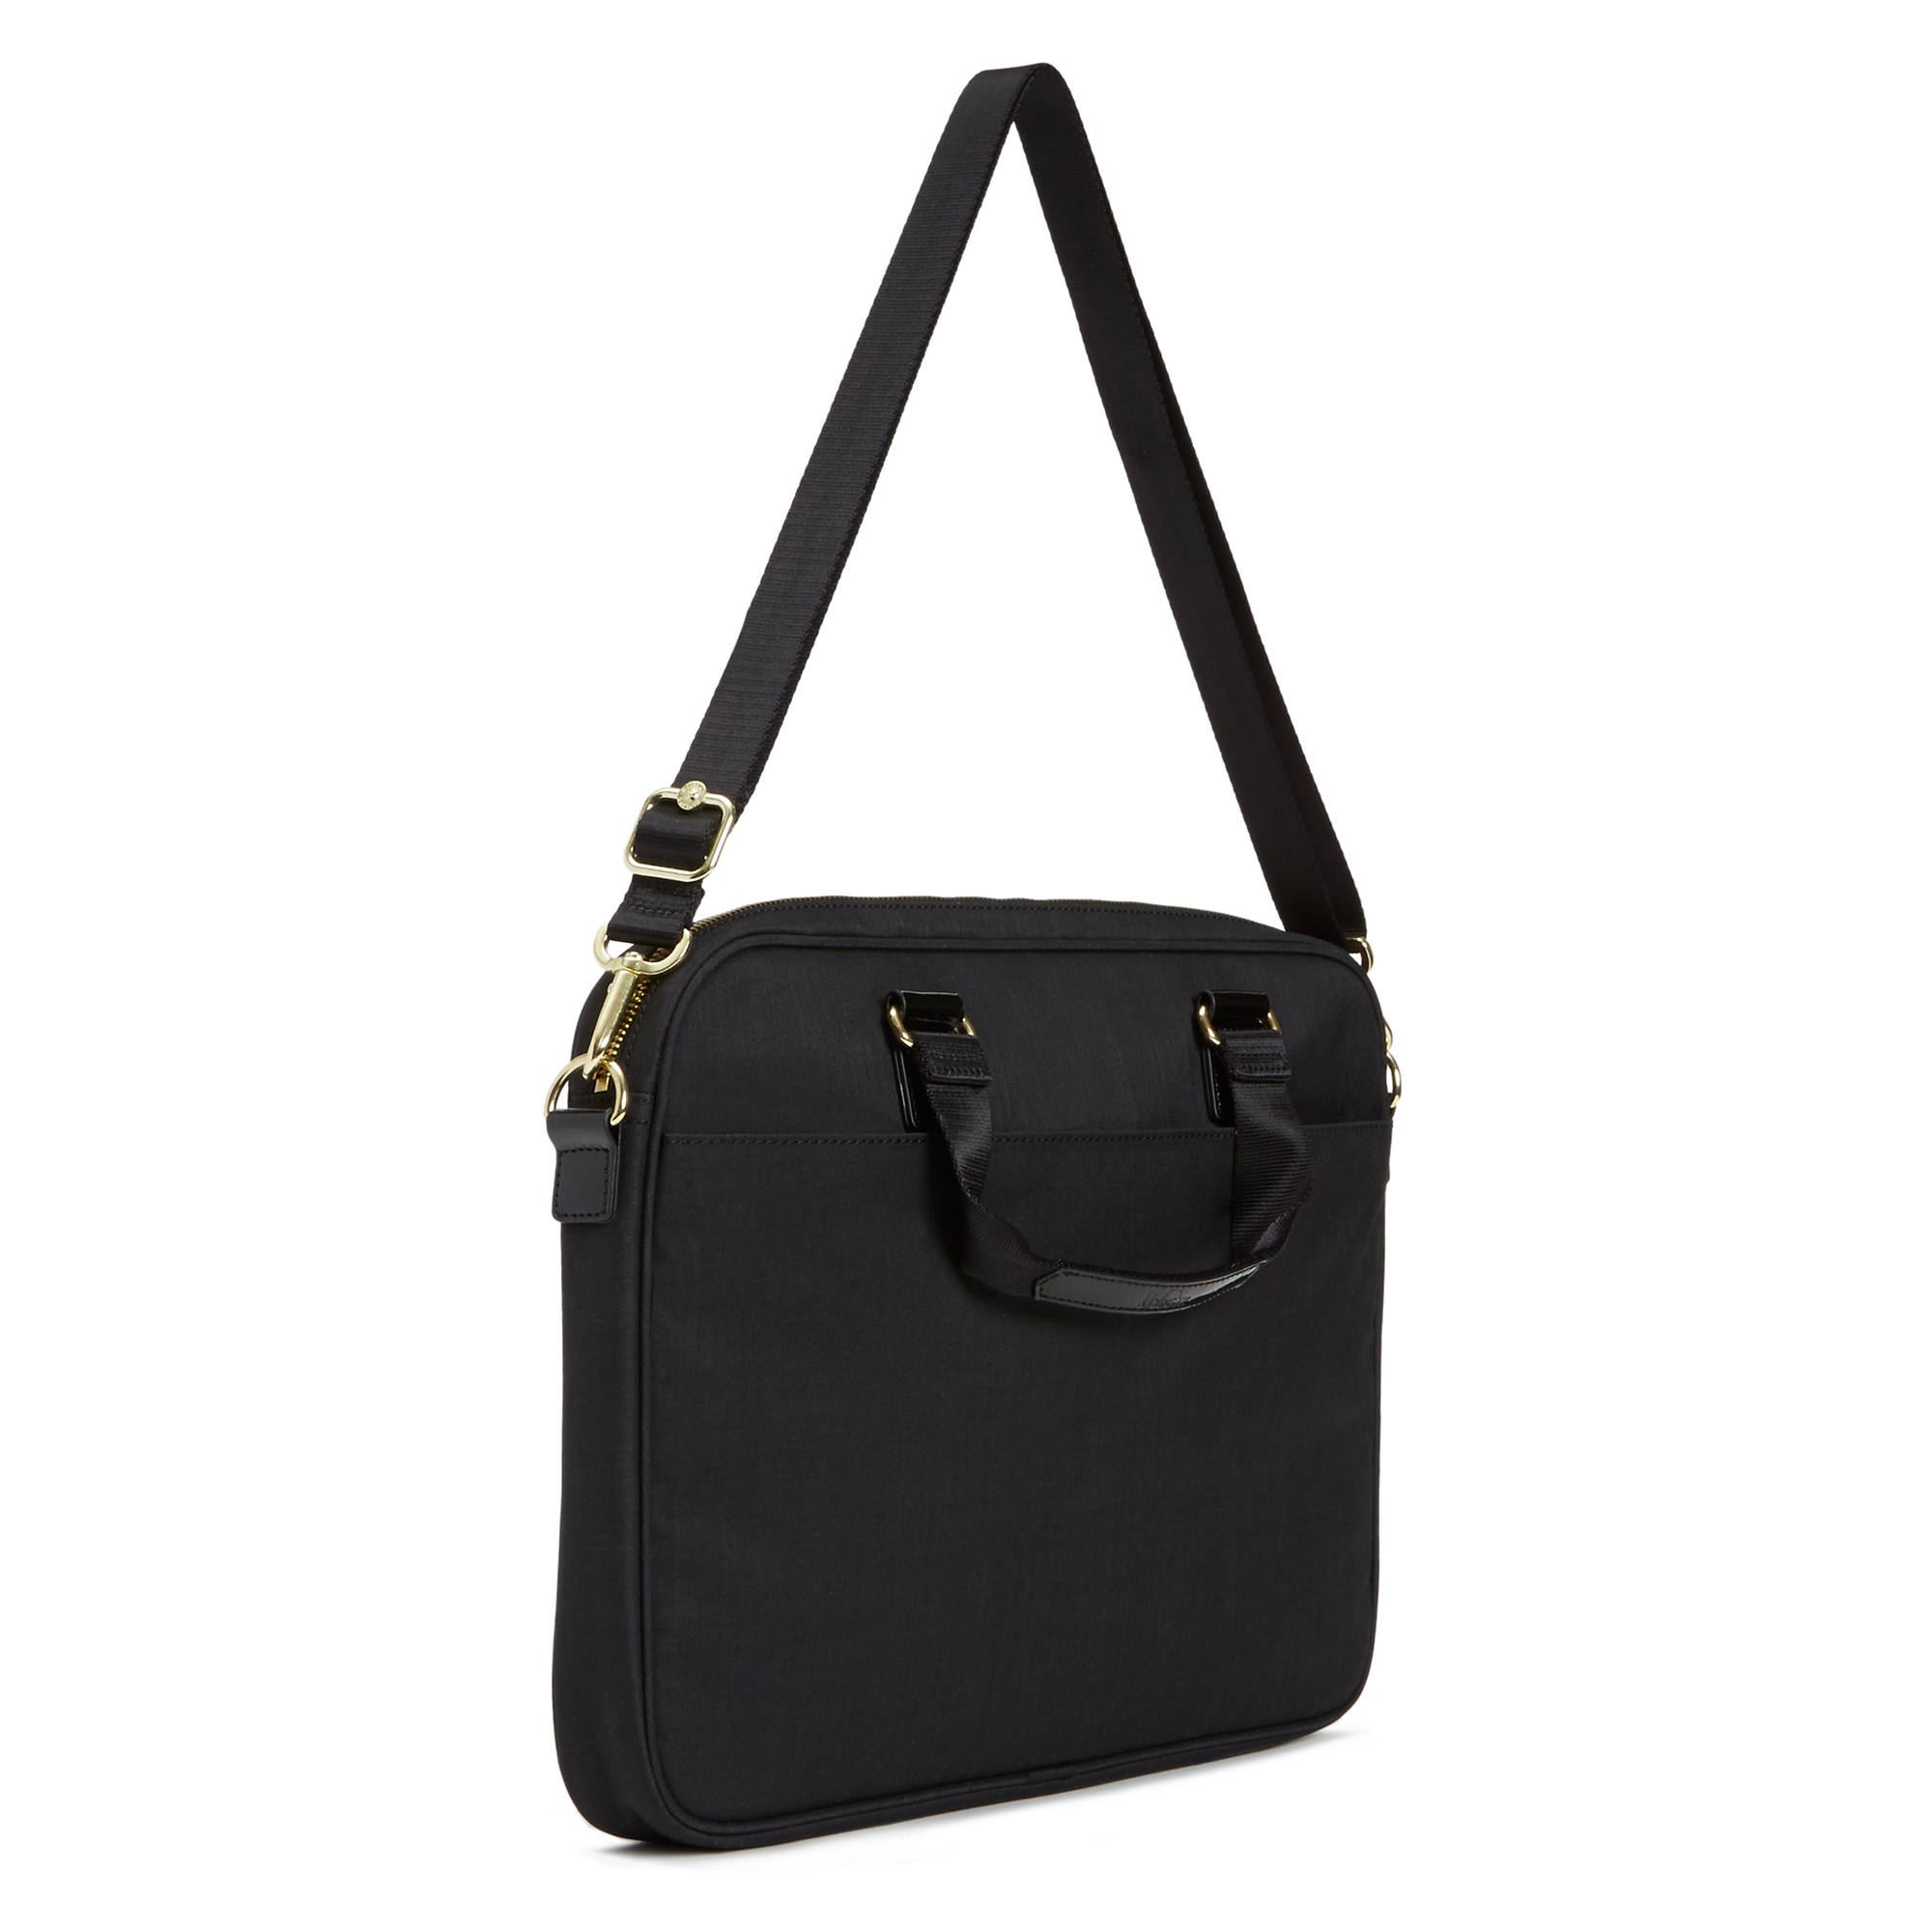 Communication on this topic: 15 Feminine Looks With Patent Leather Bags, 15-feminine-looks-with-patent-leather-bags/